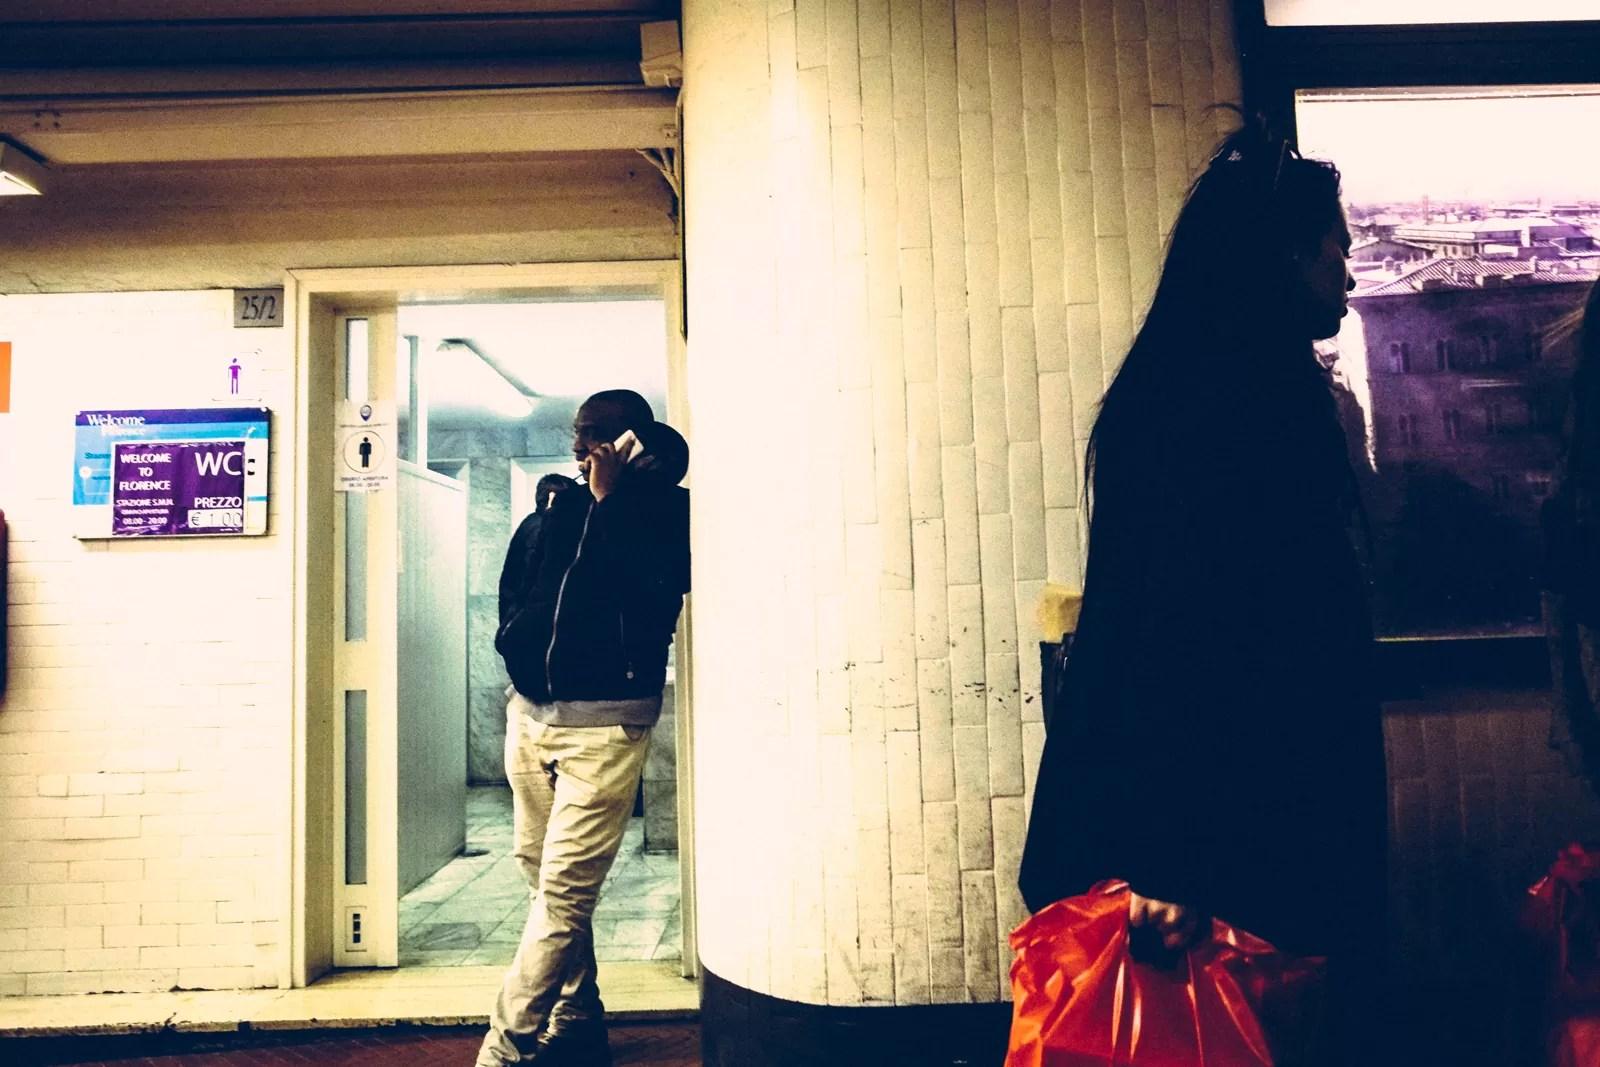 DSCF7823 - Foto fatte a c...? - Pensieri condivisi sulla street photography - fotostreet.it